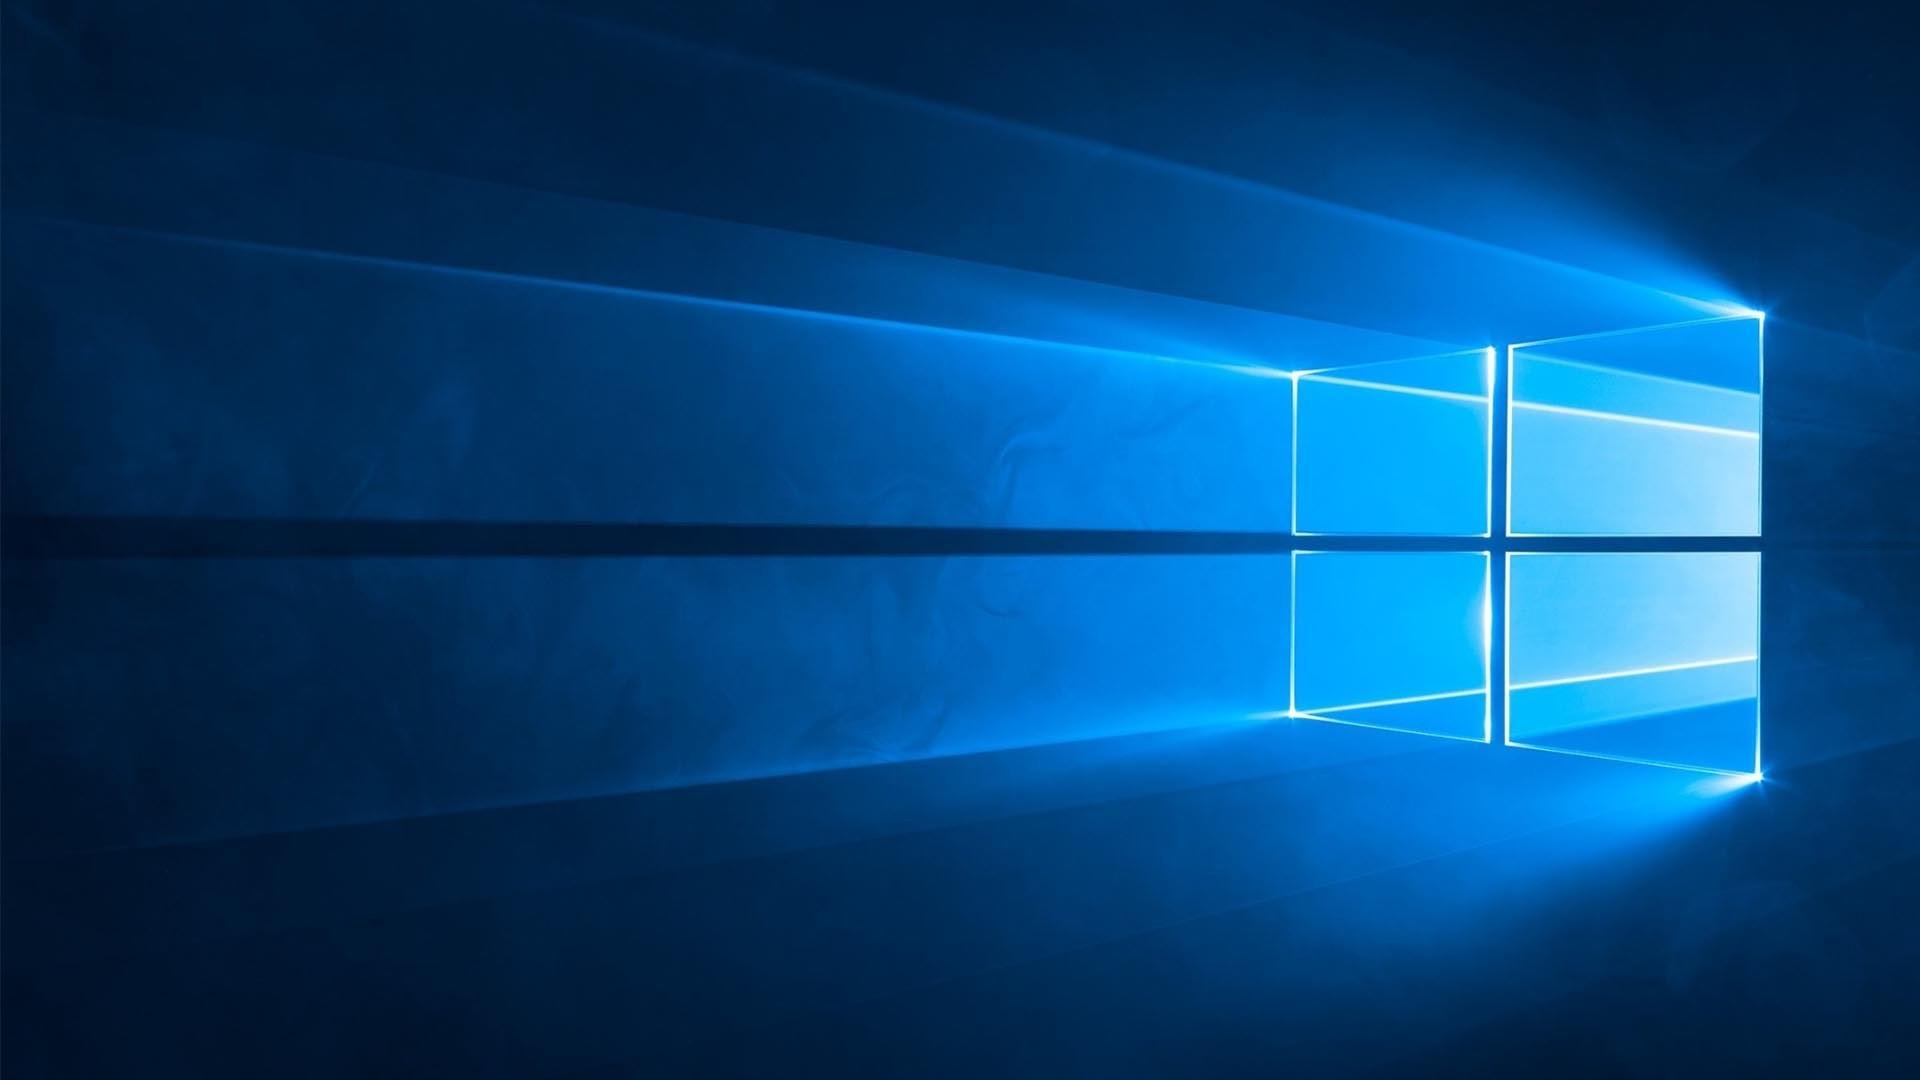 Desktopbilder Windows 10